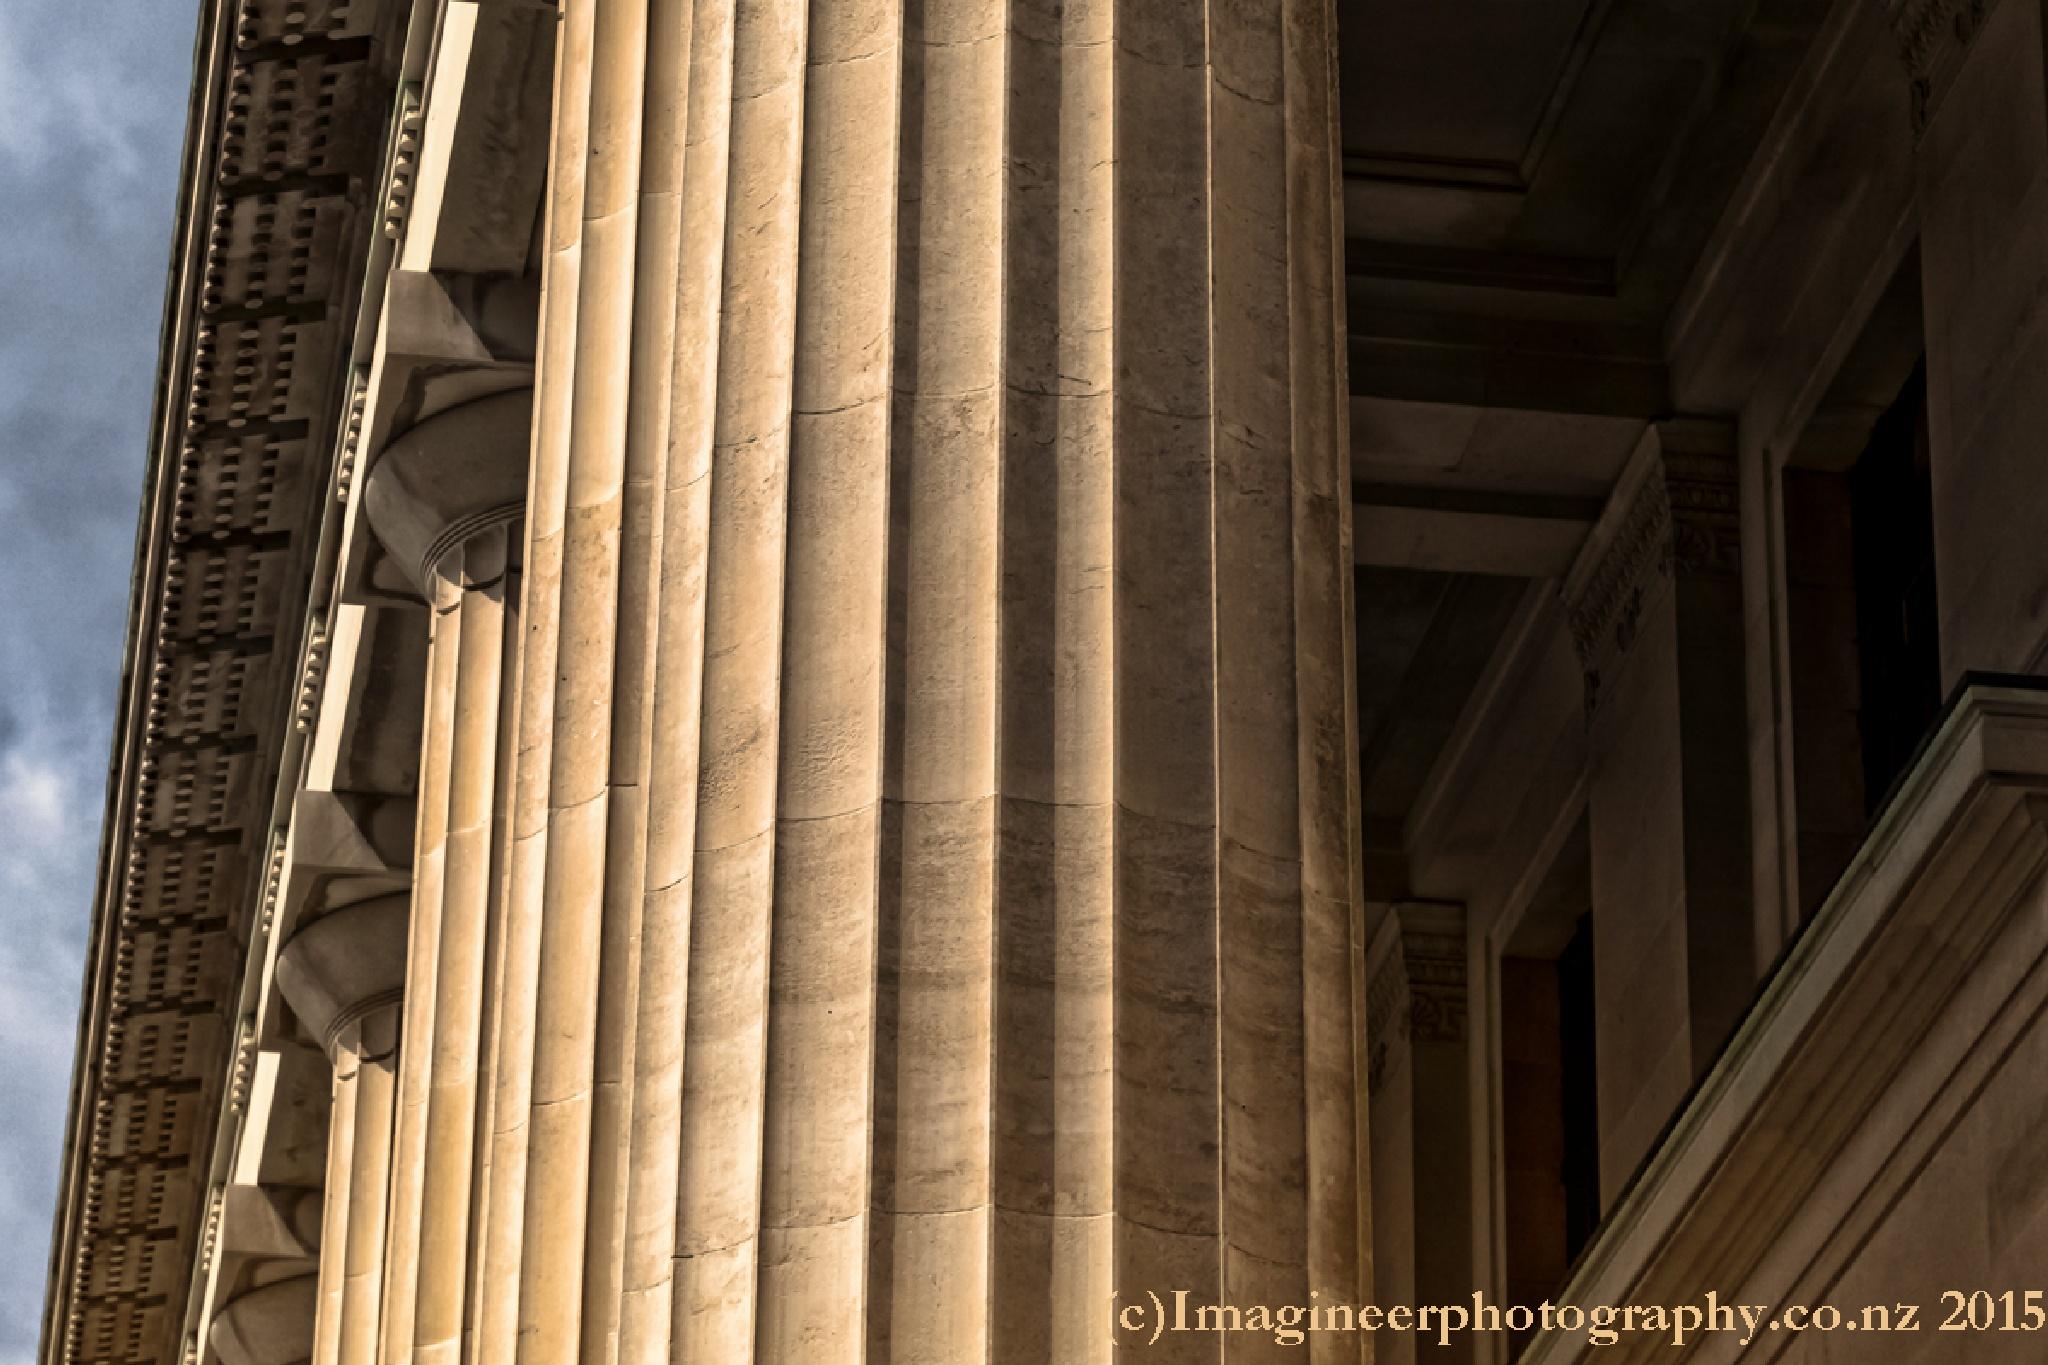 Columns by Bobby Stubblefield